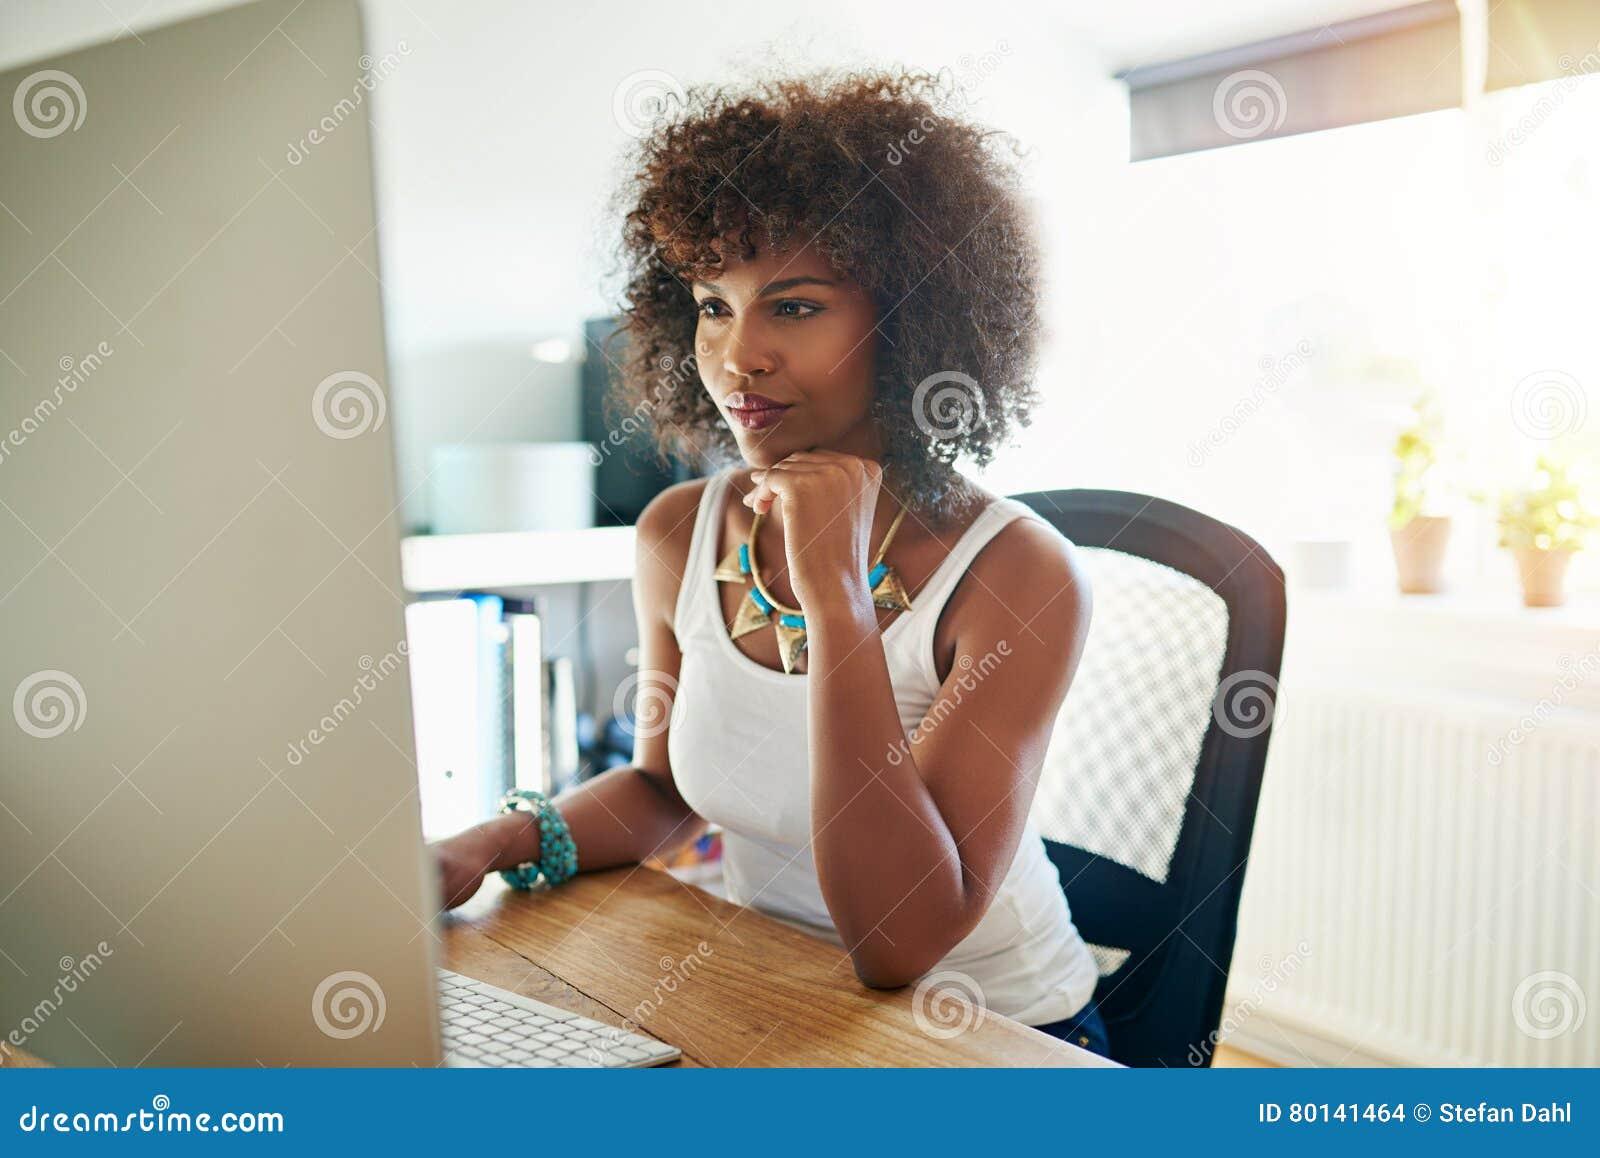 Pretty young female entrepreneur